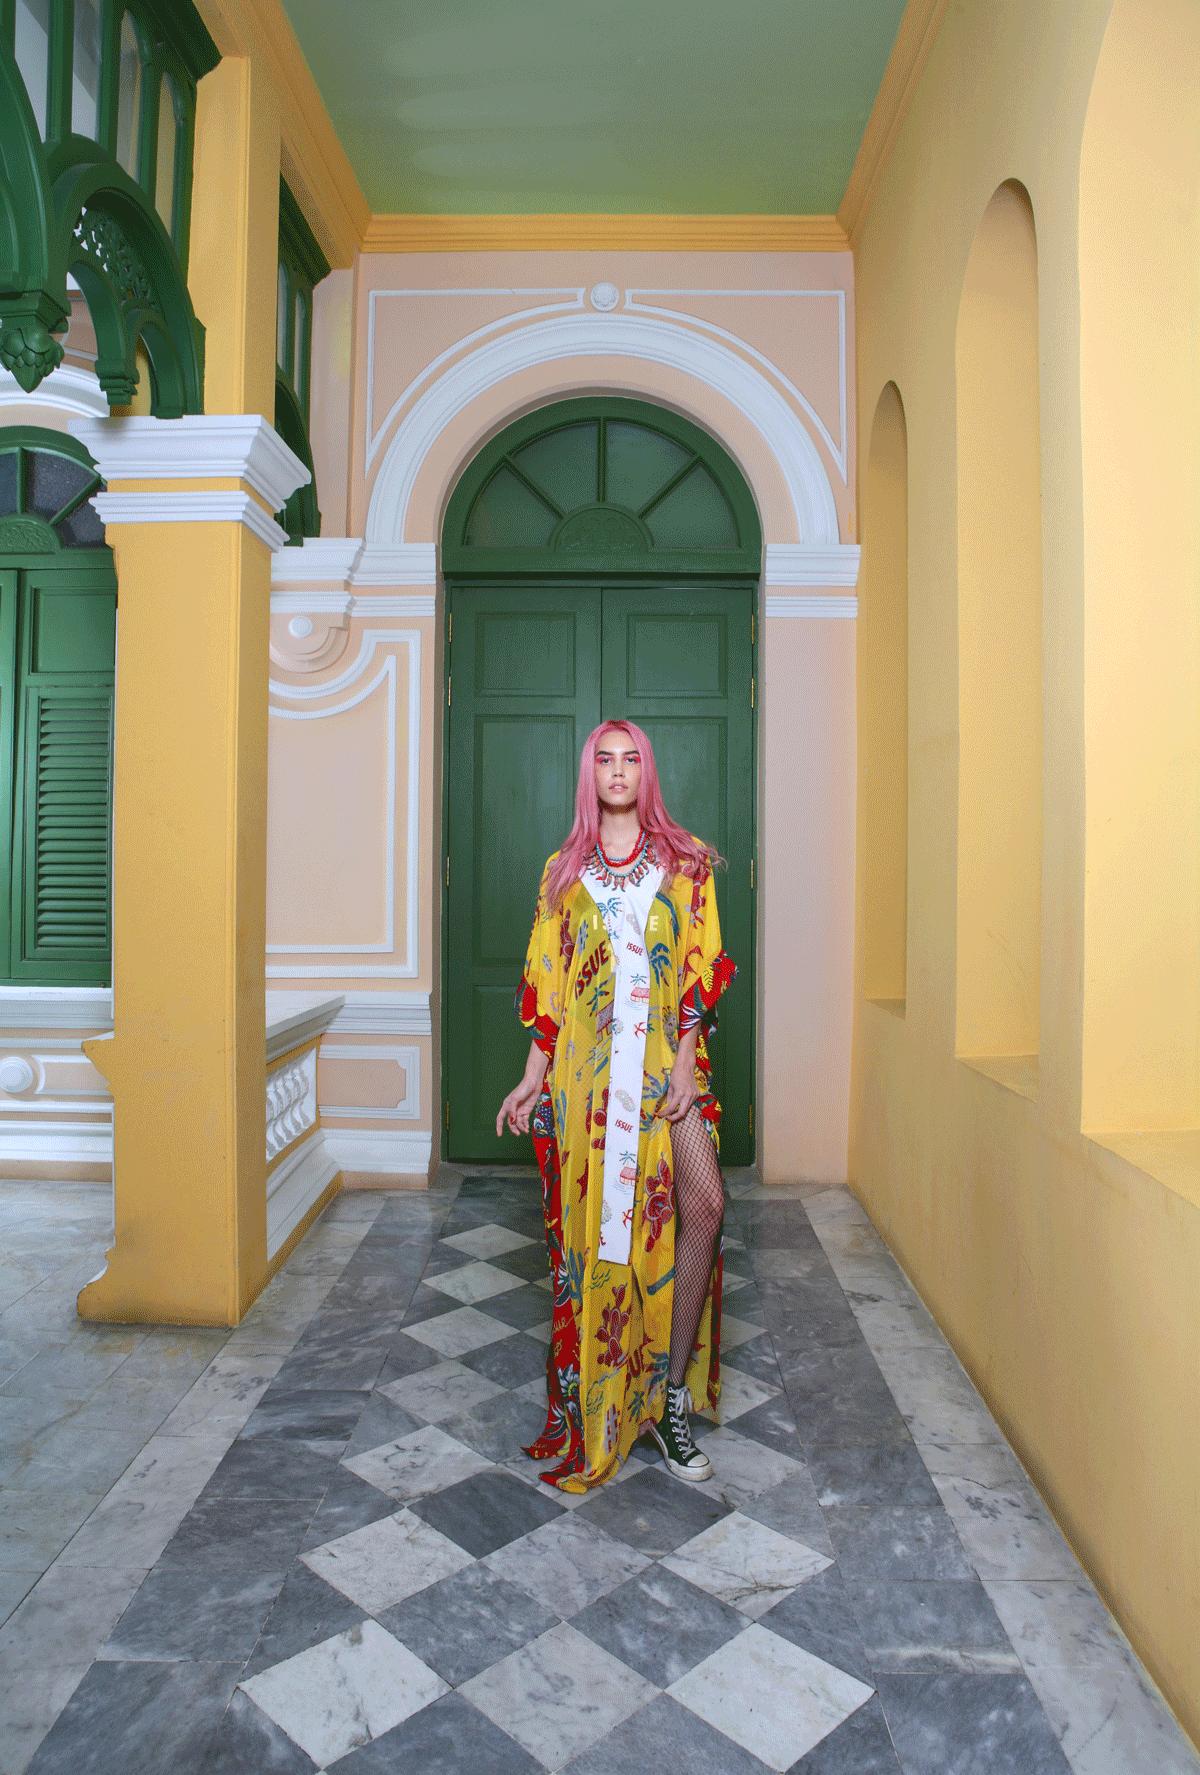 Kassandra Brain @kassybrain in ISSUE / accessories : 77th